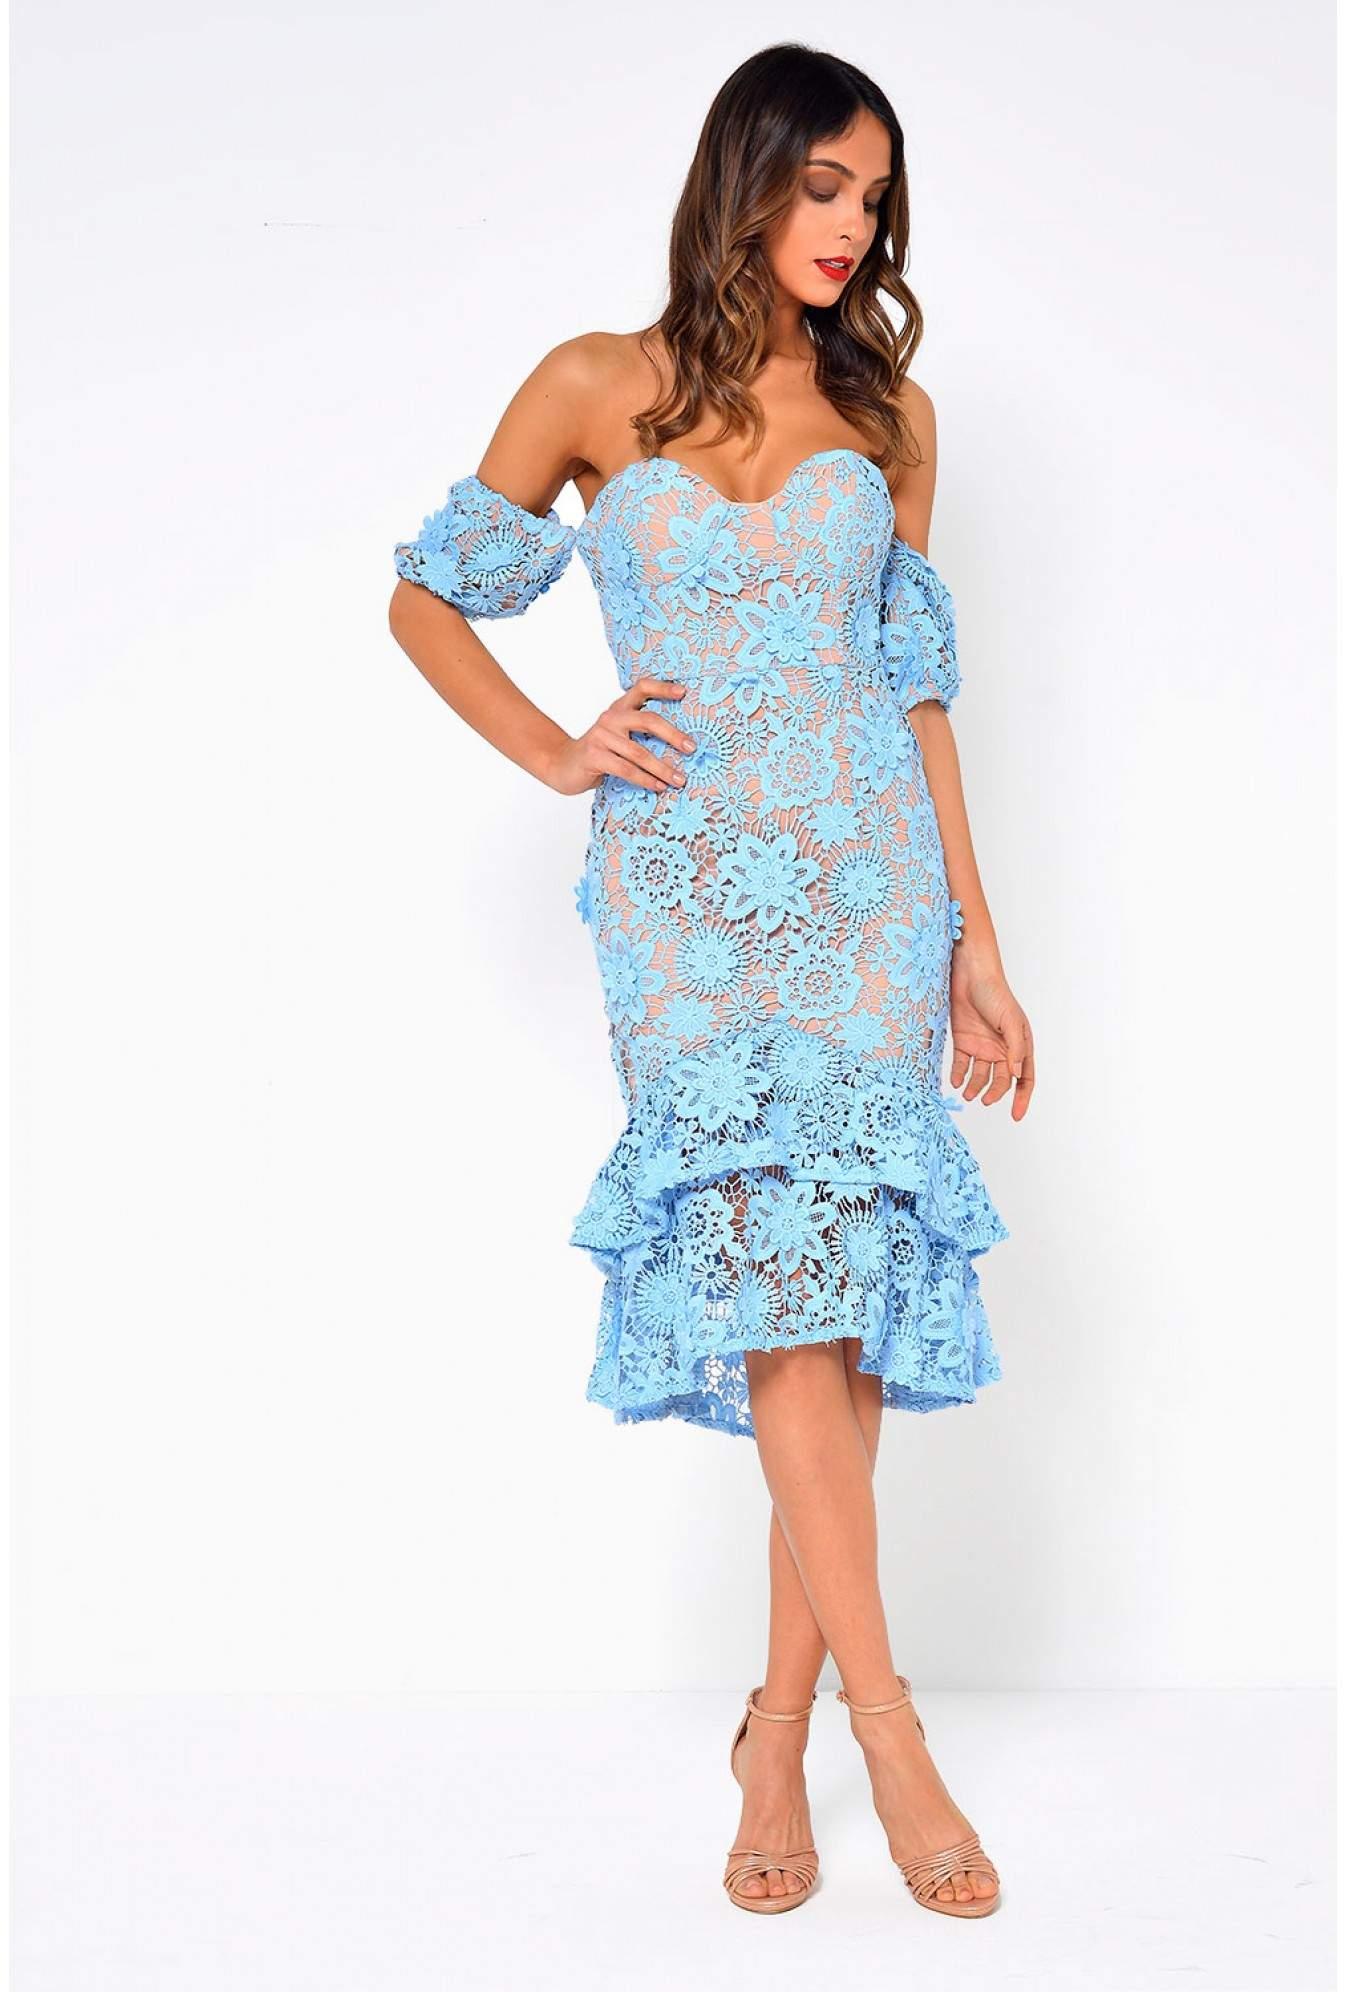 72bd57703c Soho Market Merrilee Off Shoulder Crochet Midi Dress in Blue | iCLOTHING